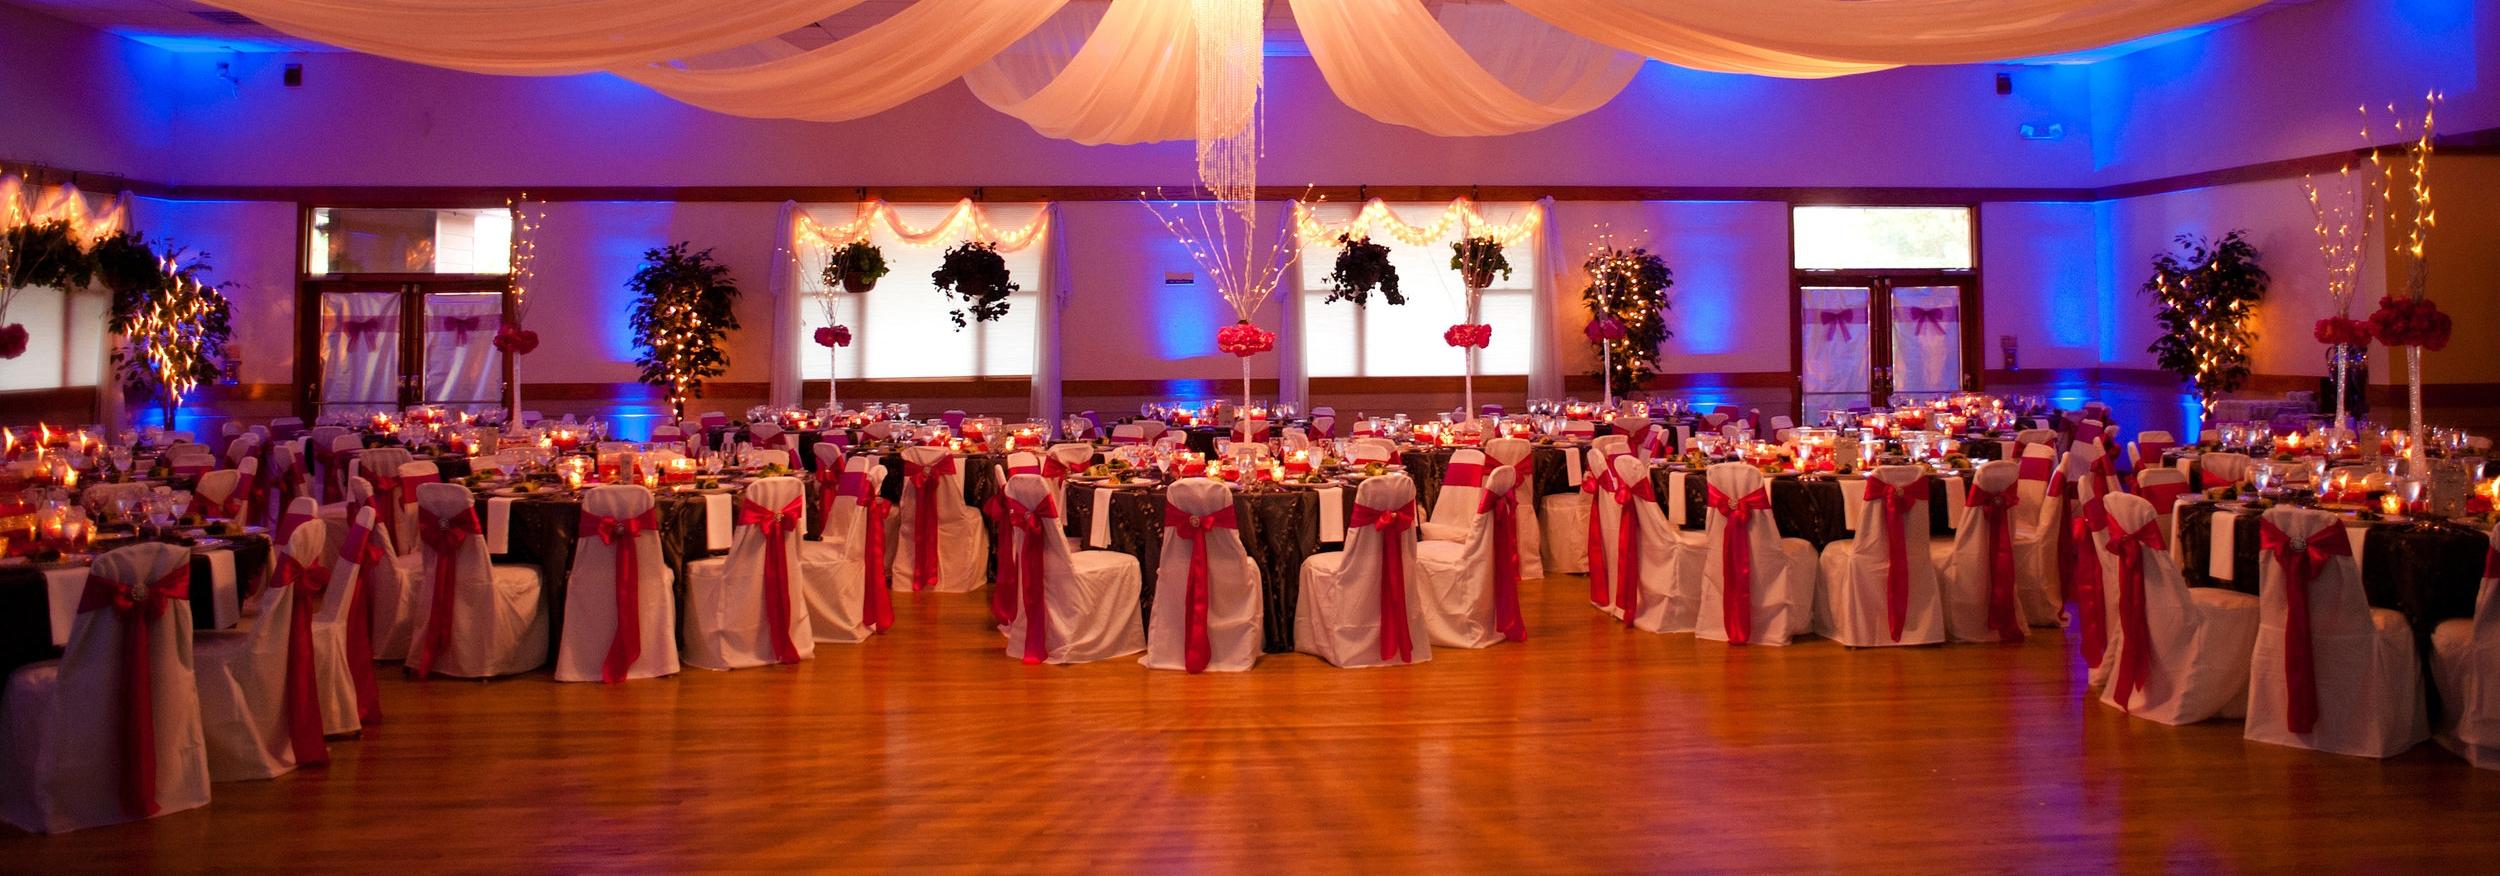 Ballroom Wide Shot 2.jpg